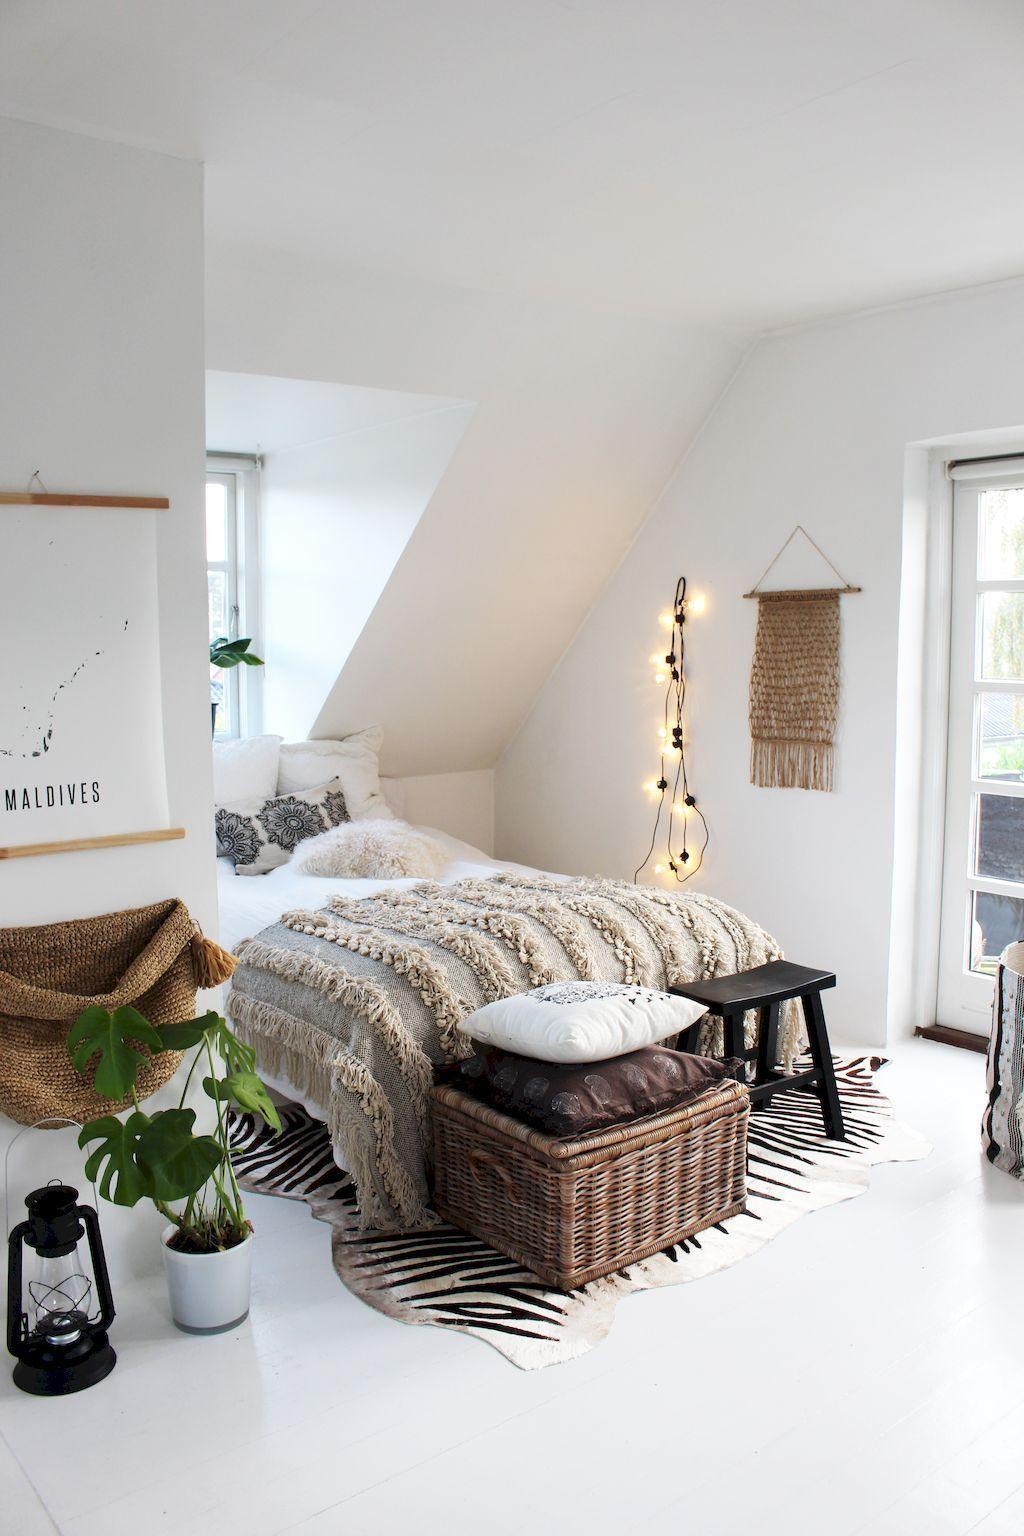 Best 40 Simple Minimalist And Cozy Bedroom Decor Ideas Diy 400 x 300